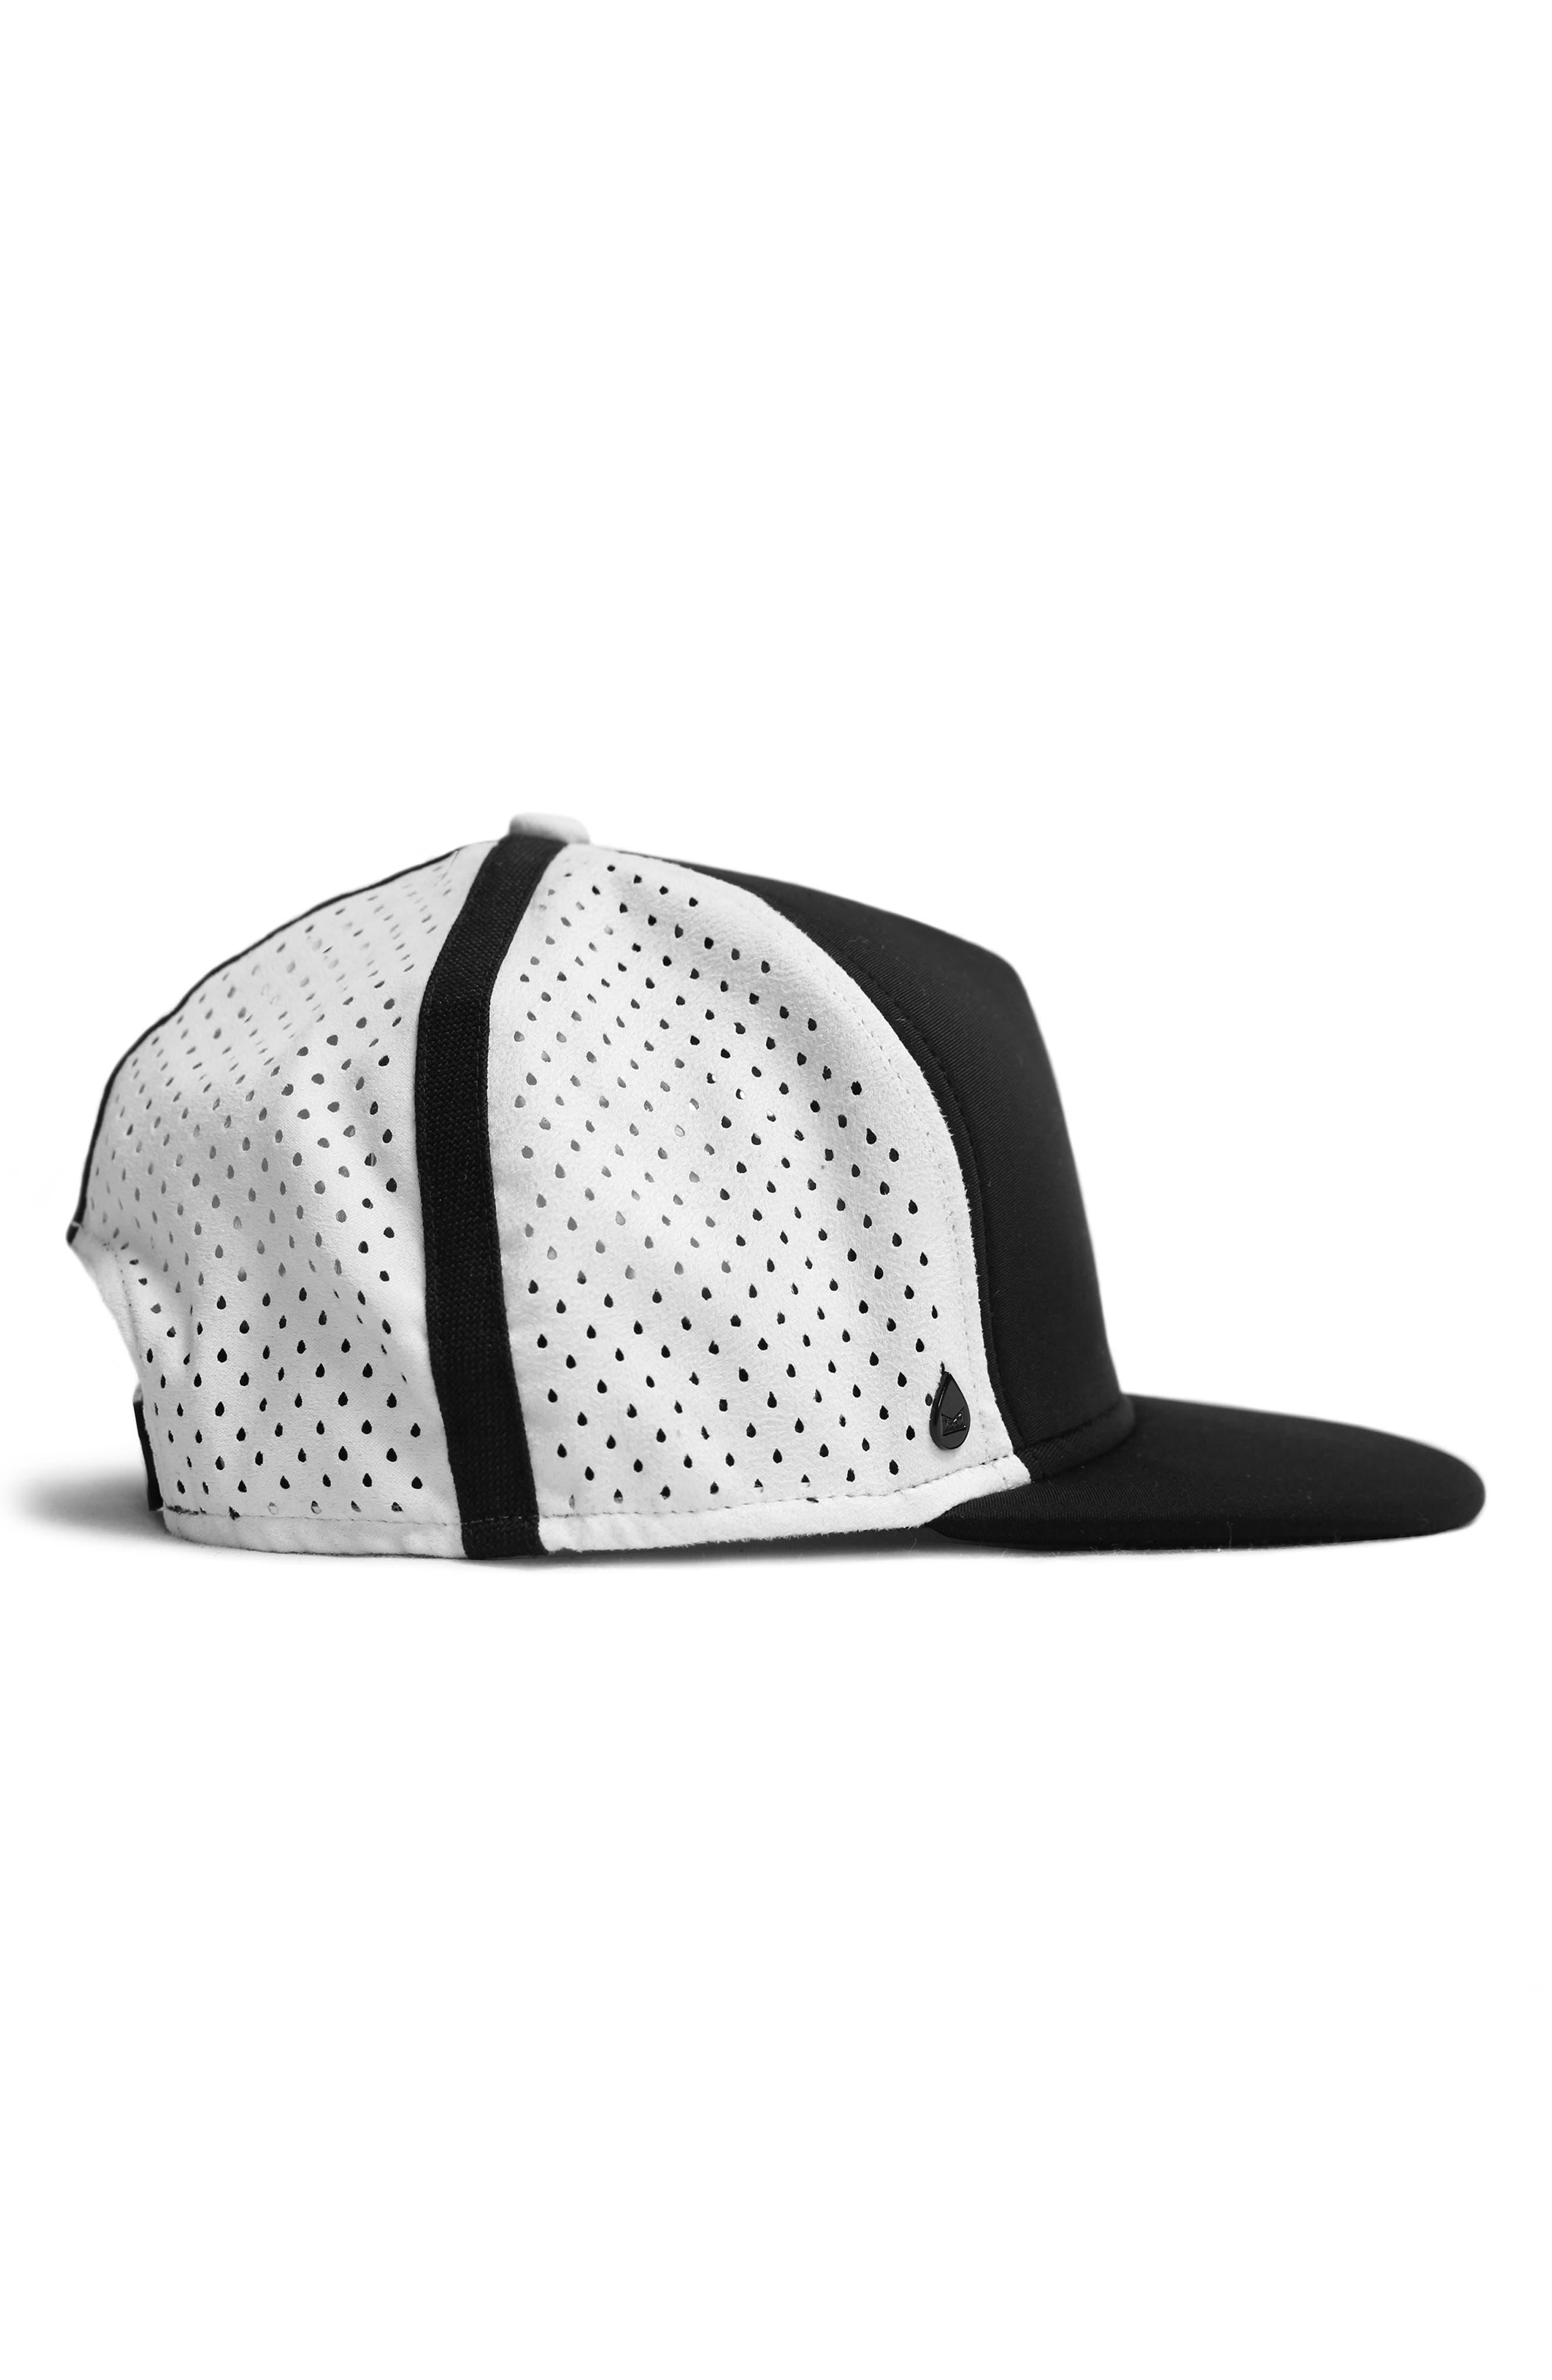 'Amphibian' Split Fit Snapback Baseball Cap,                             Alternate thumbnail 7, color,                             006